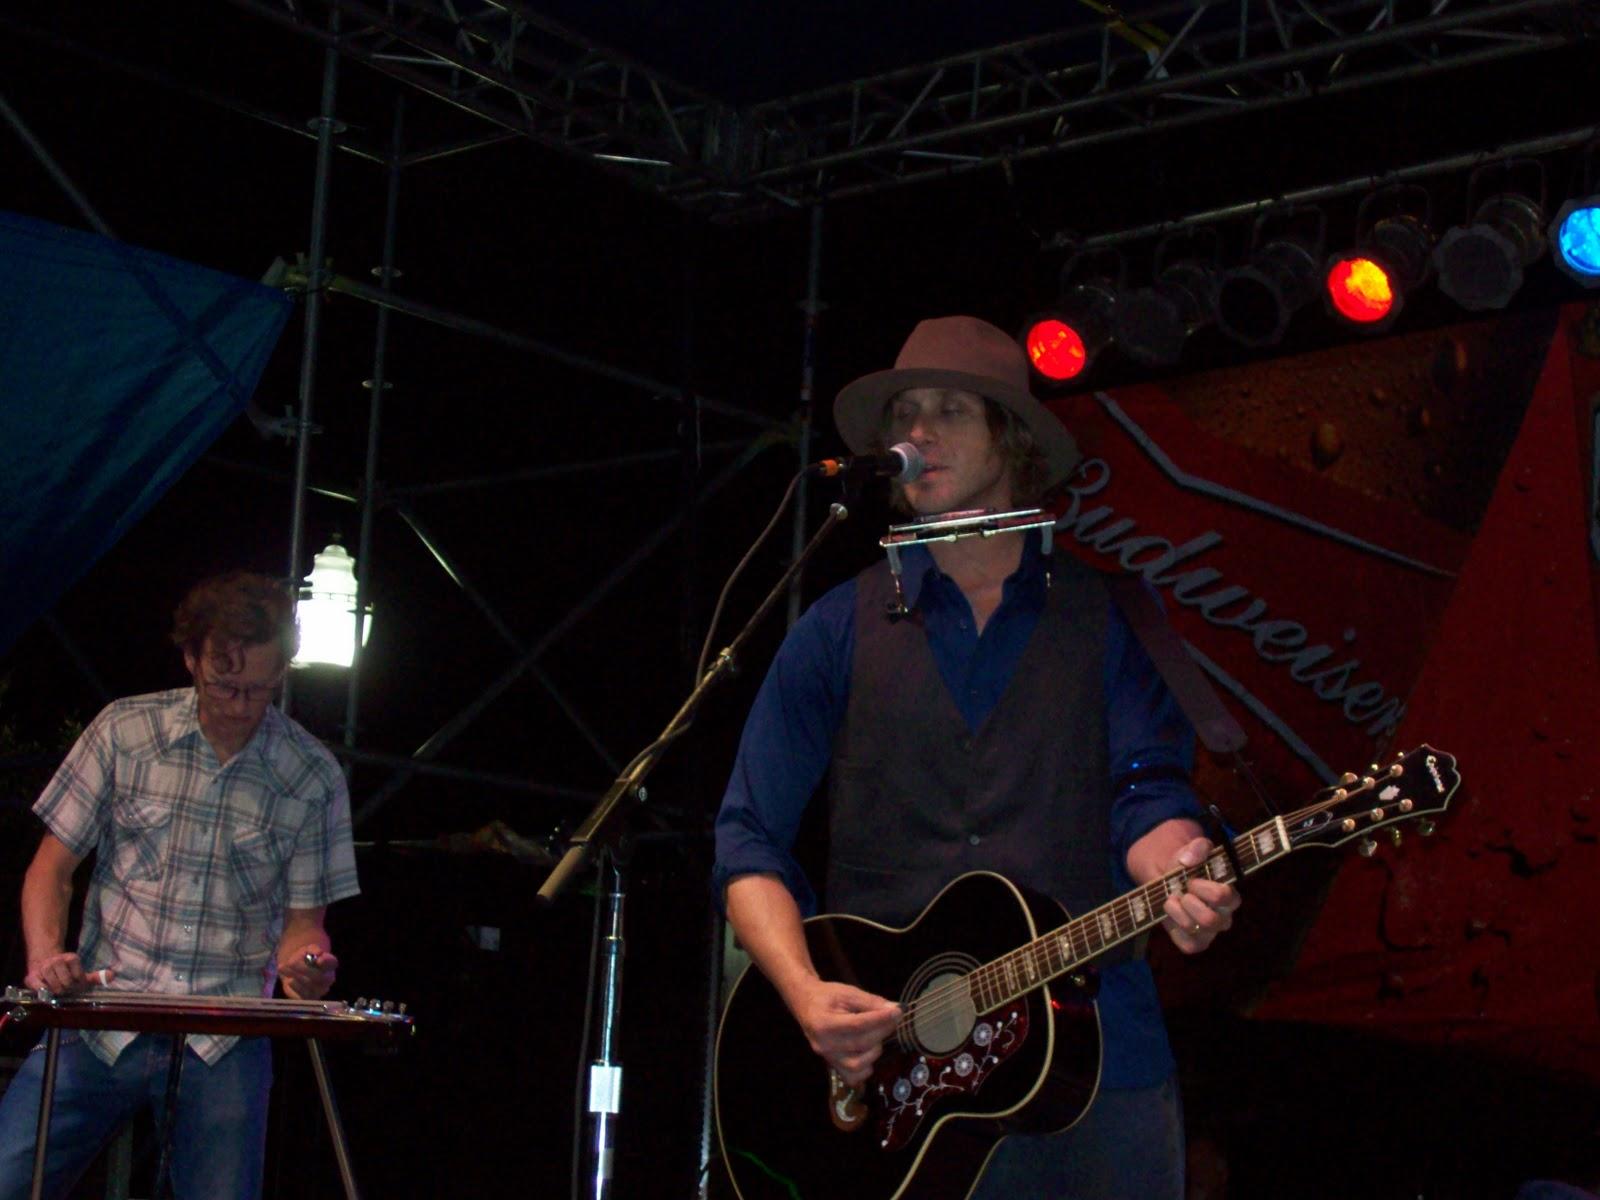 Conroe Cajun Catfish Festival - 101_0643.JPG